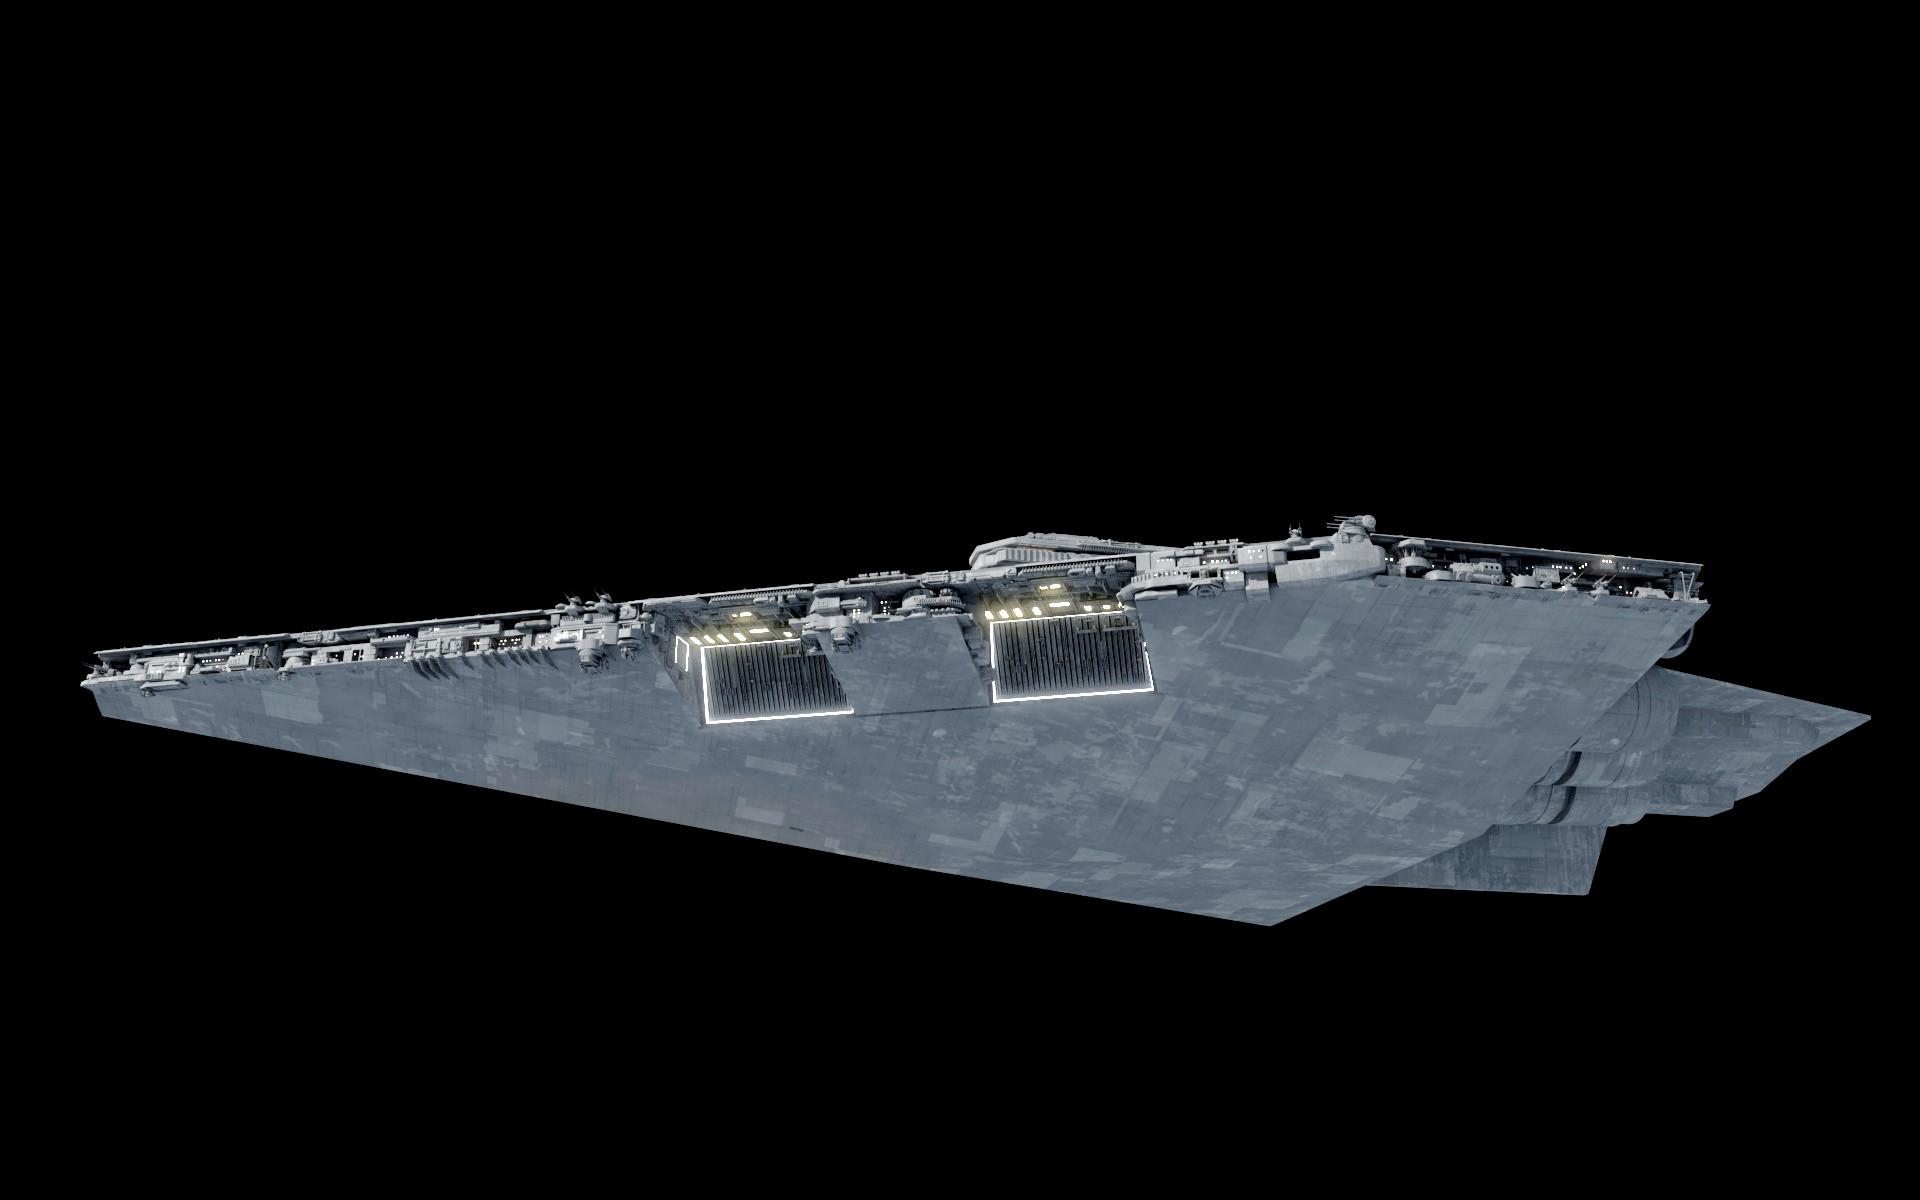 Ansel hsiao frigate11